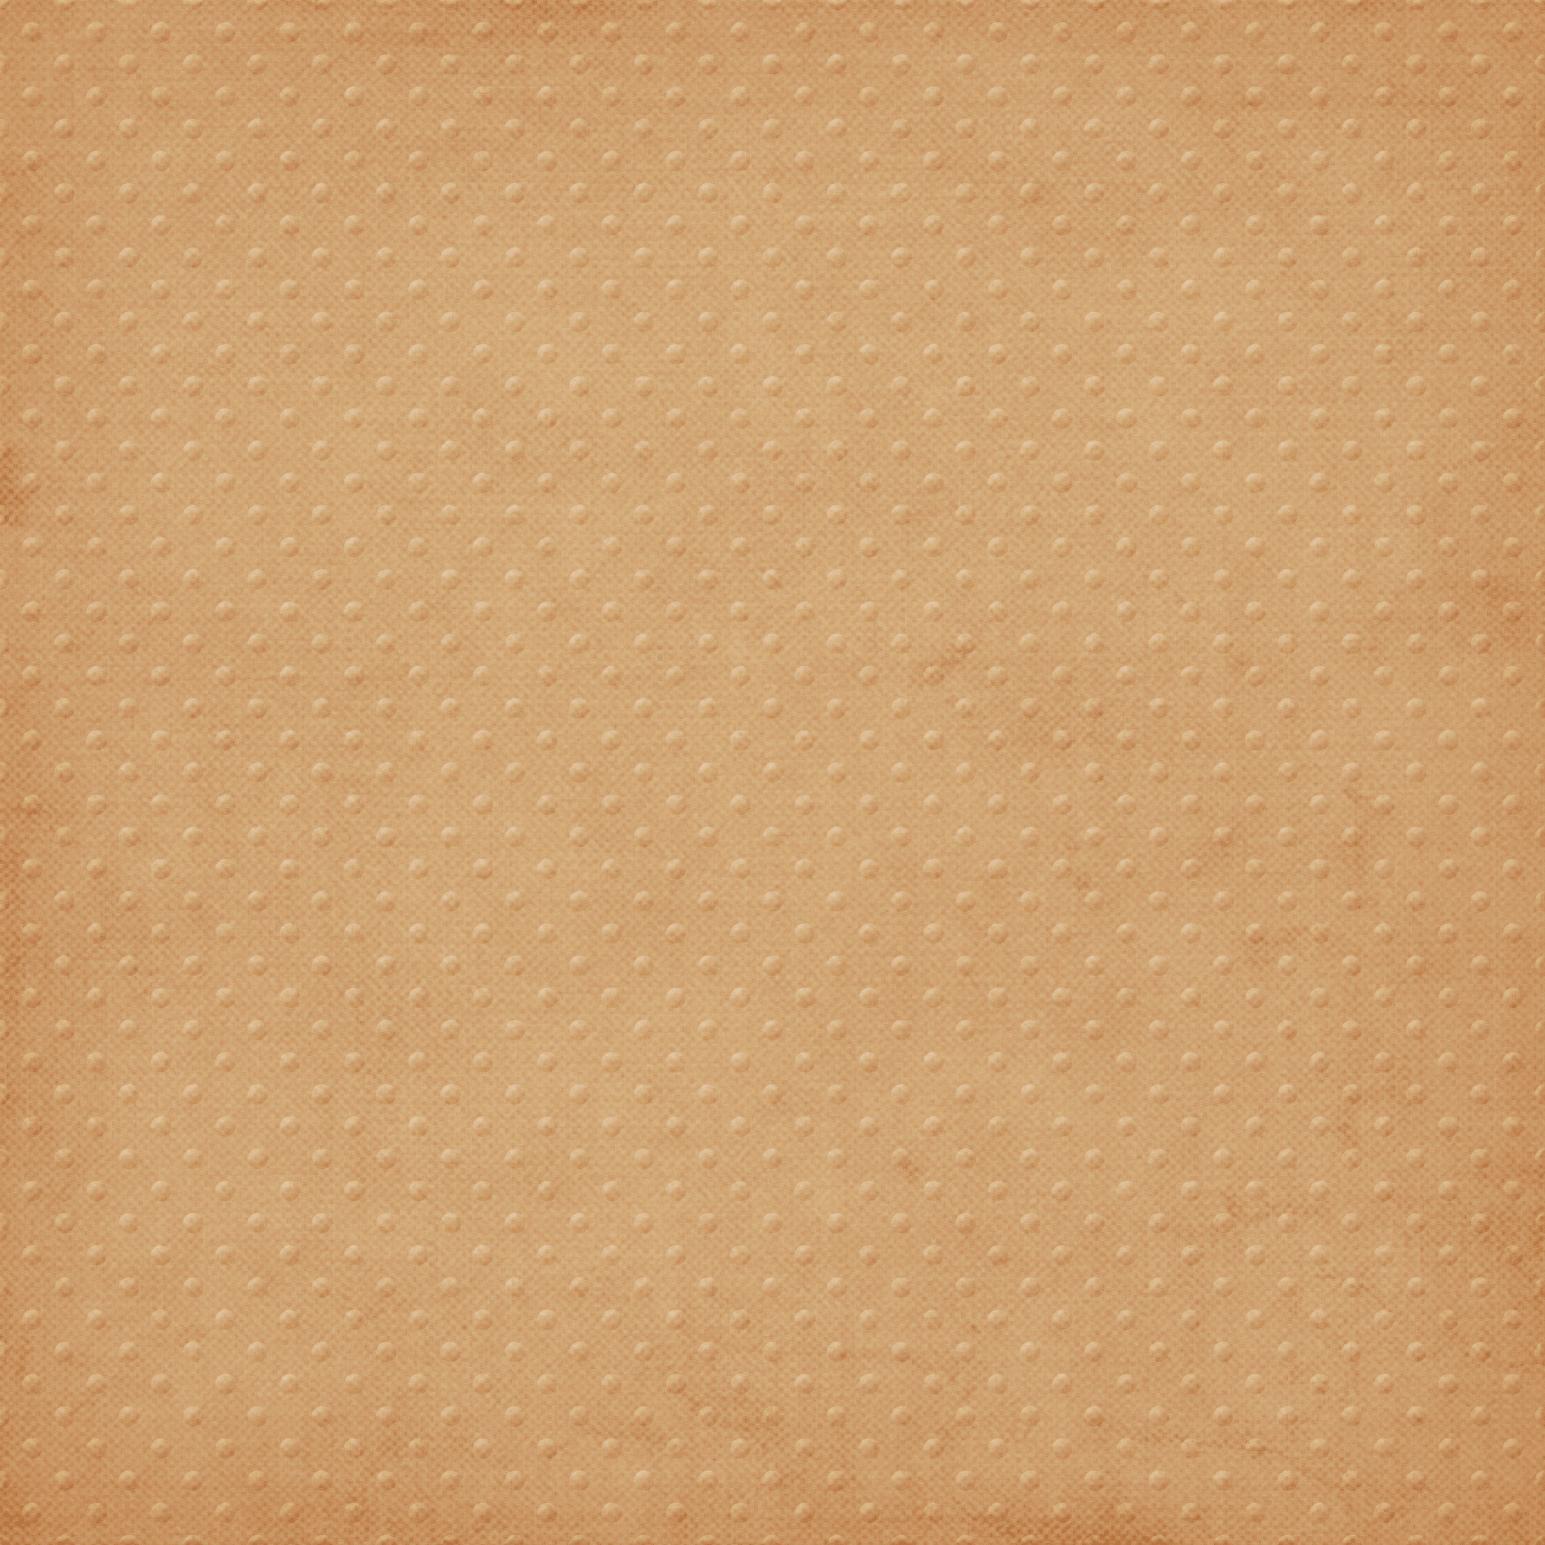 papel digital safari aquarela 1